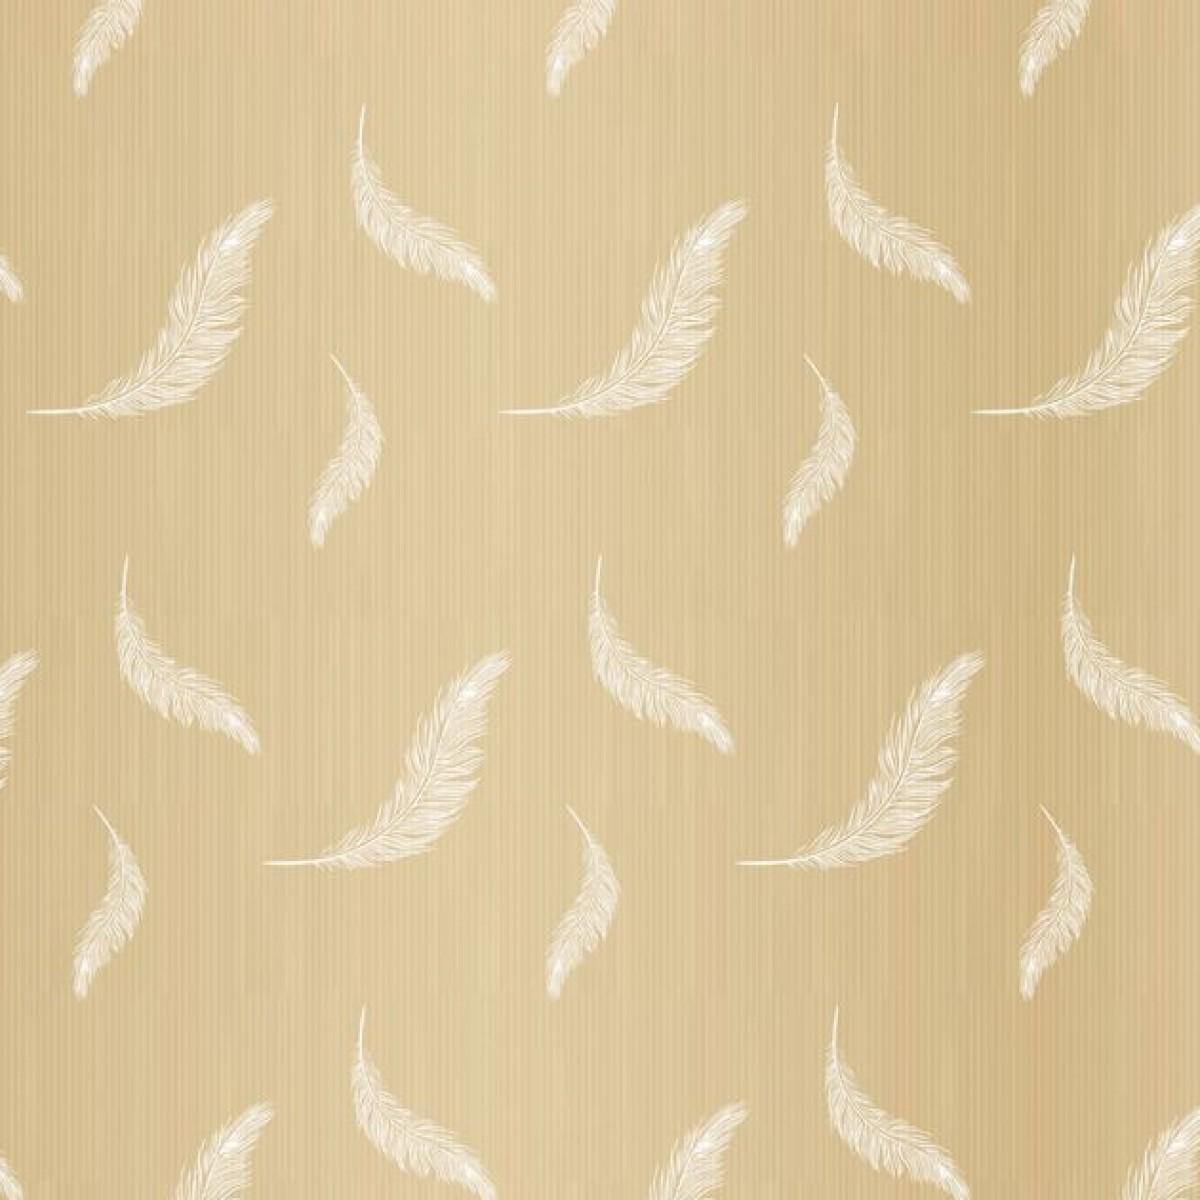 7206 Feather Print White 50cmx25m Kraft Paper - 1 Roll